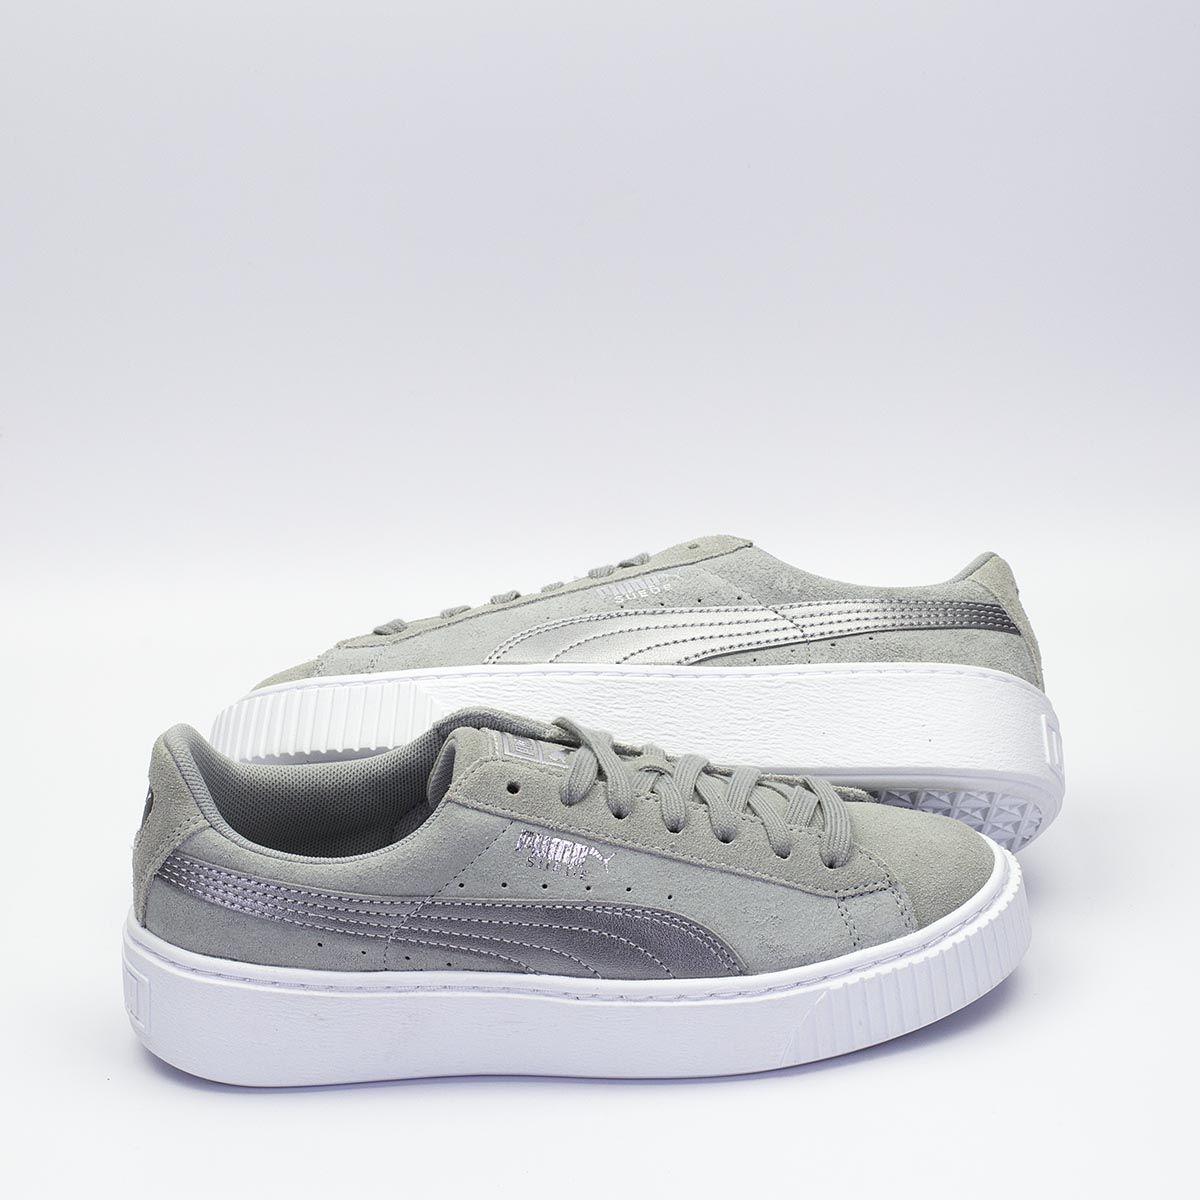 sports shoes 6125a e67f1 Puma Suede Platform Safari γκρι, συμπληρώνει κάθε streetwear ...